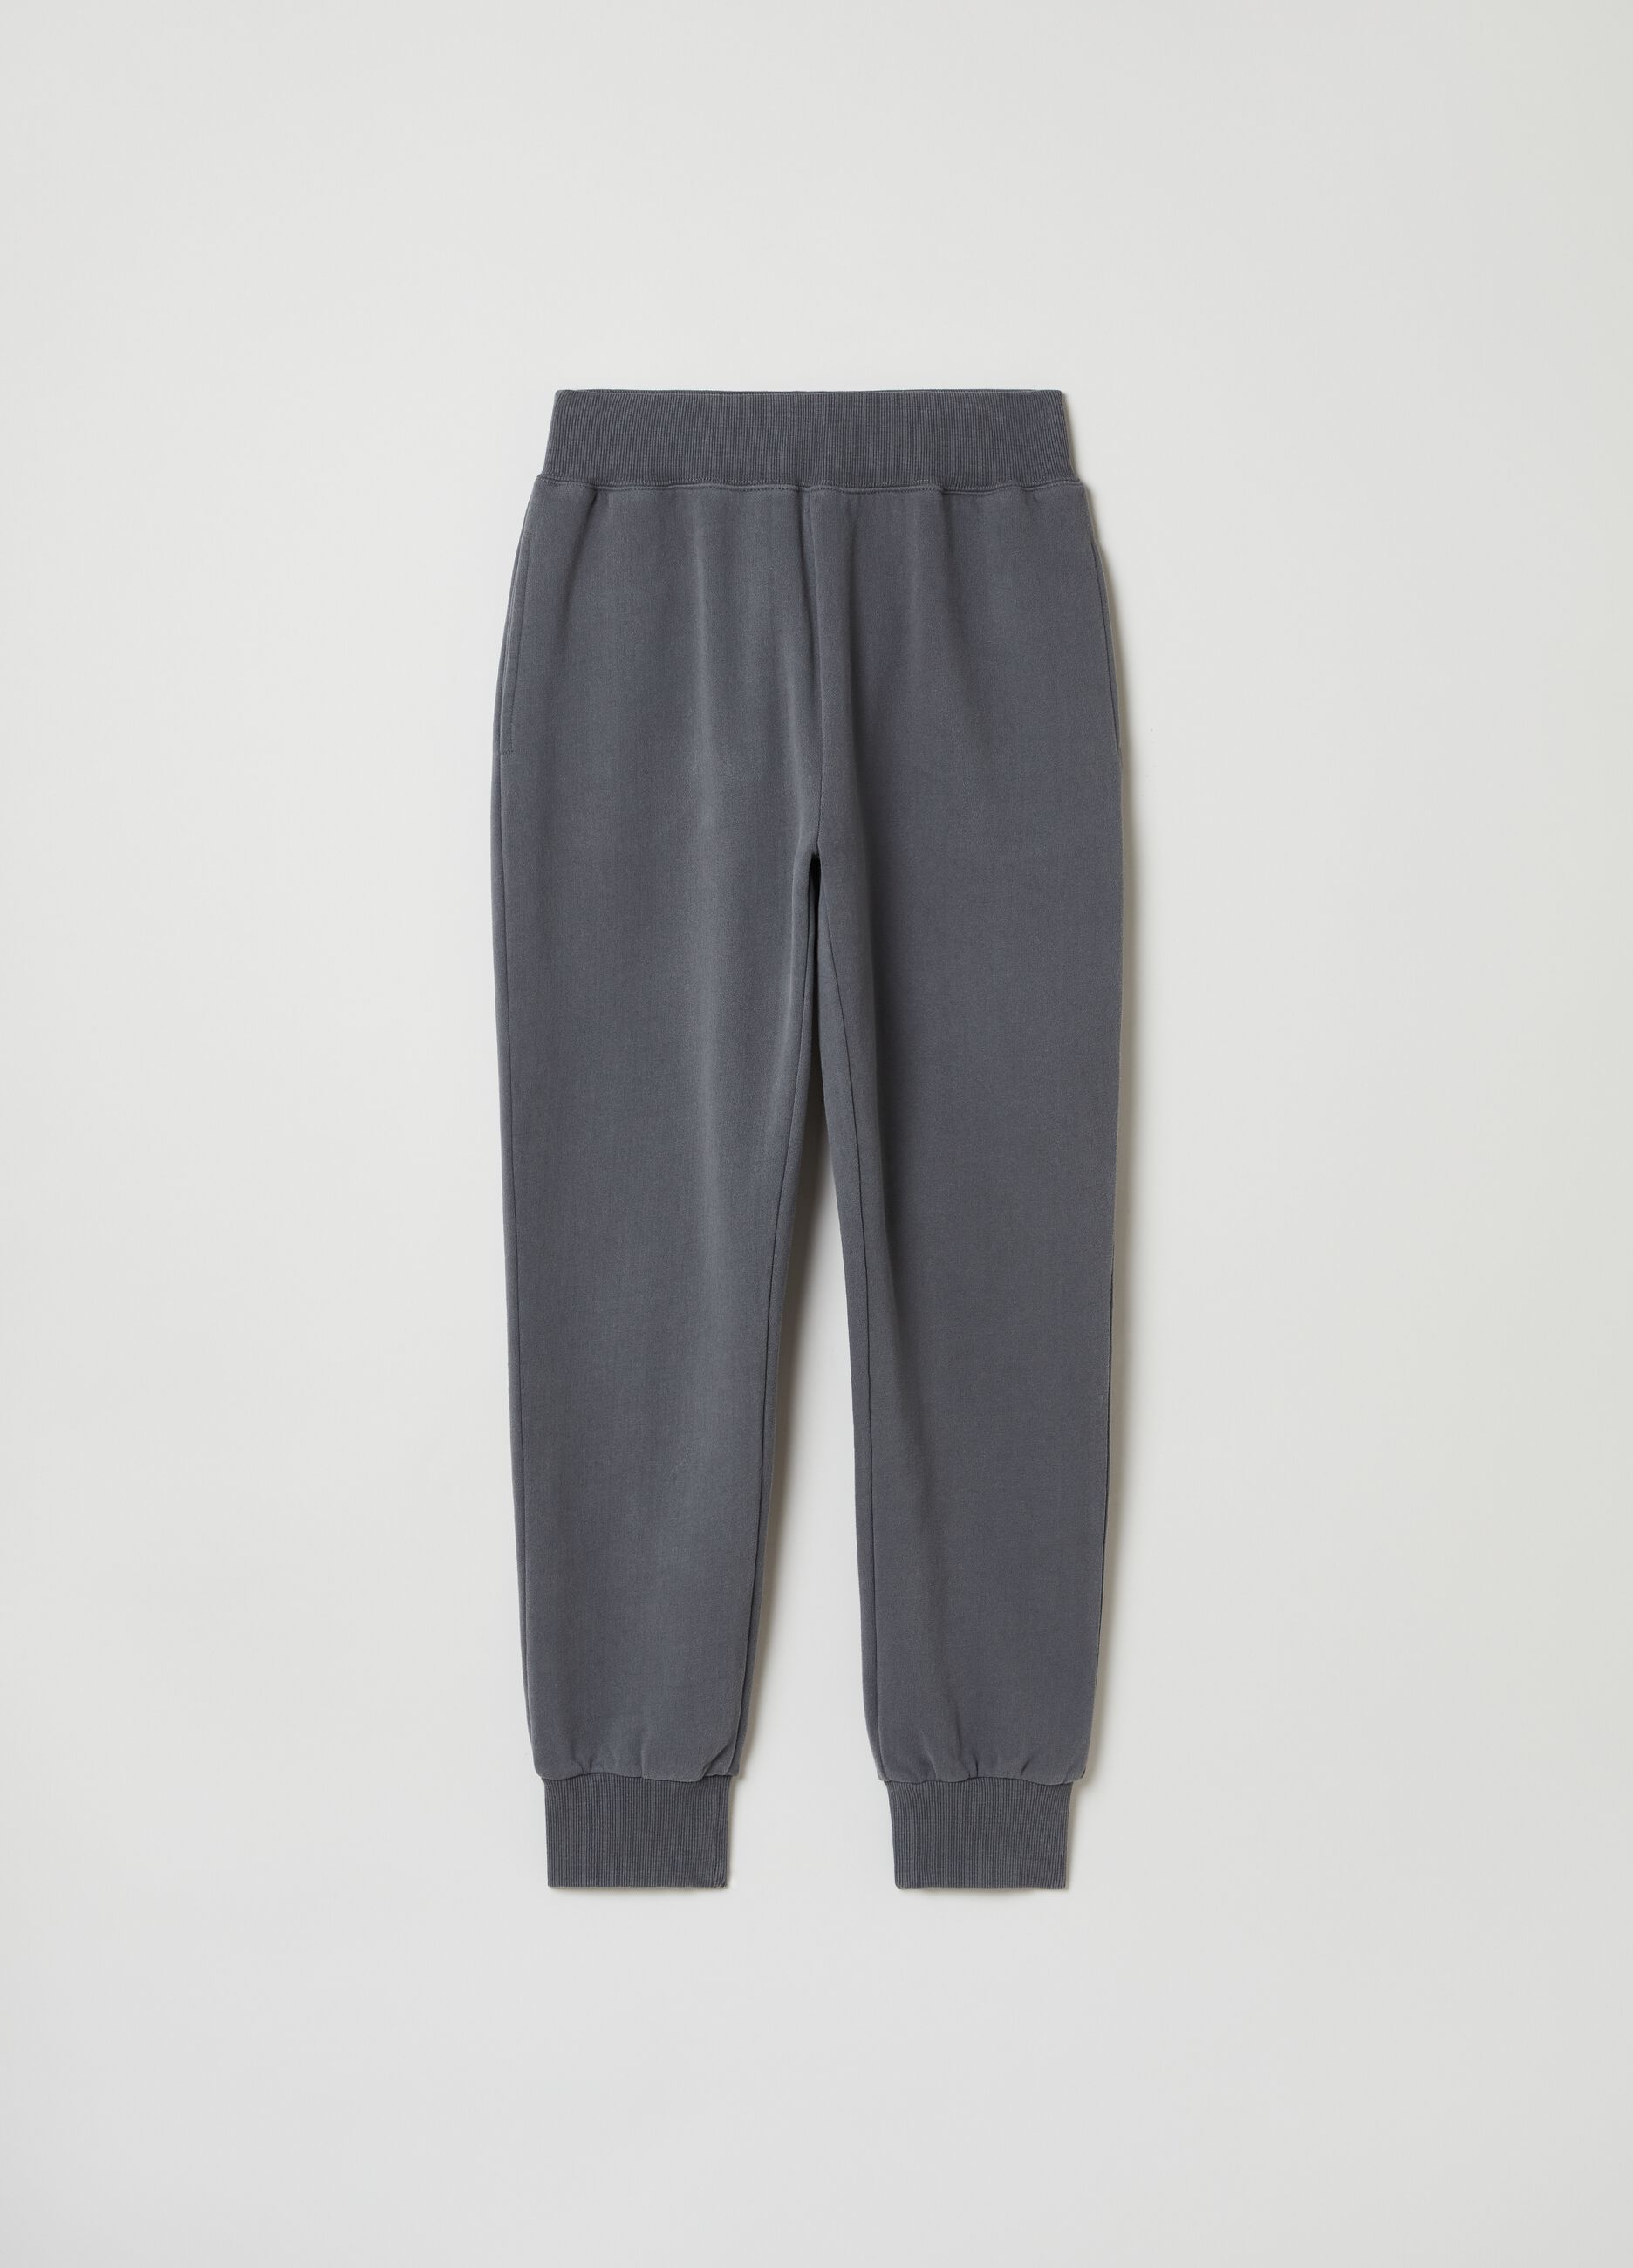 Pantalone jogging in felpa slim fit Grigio